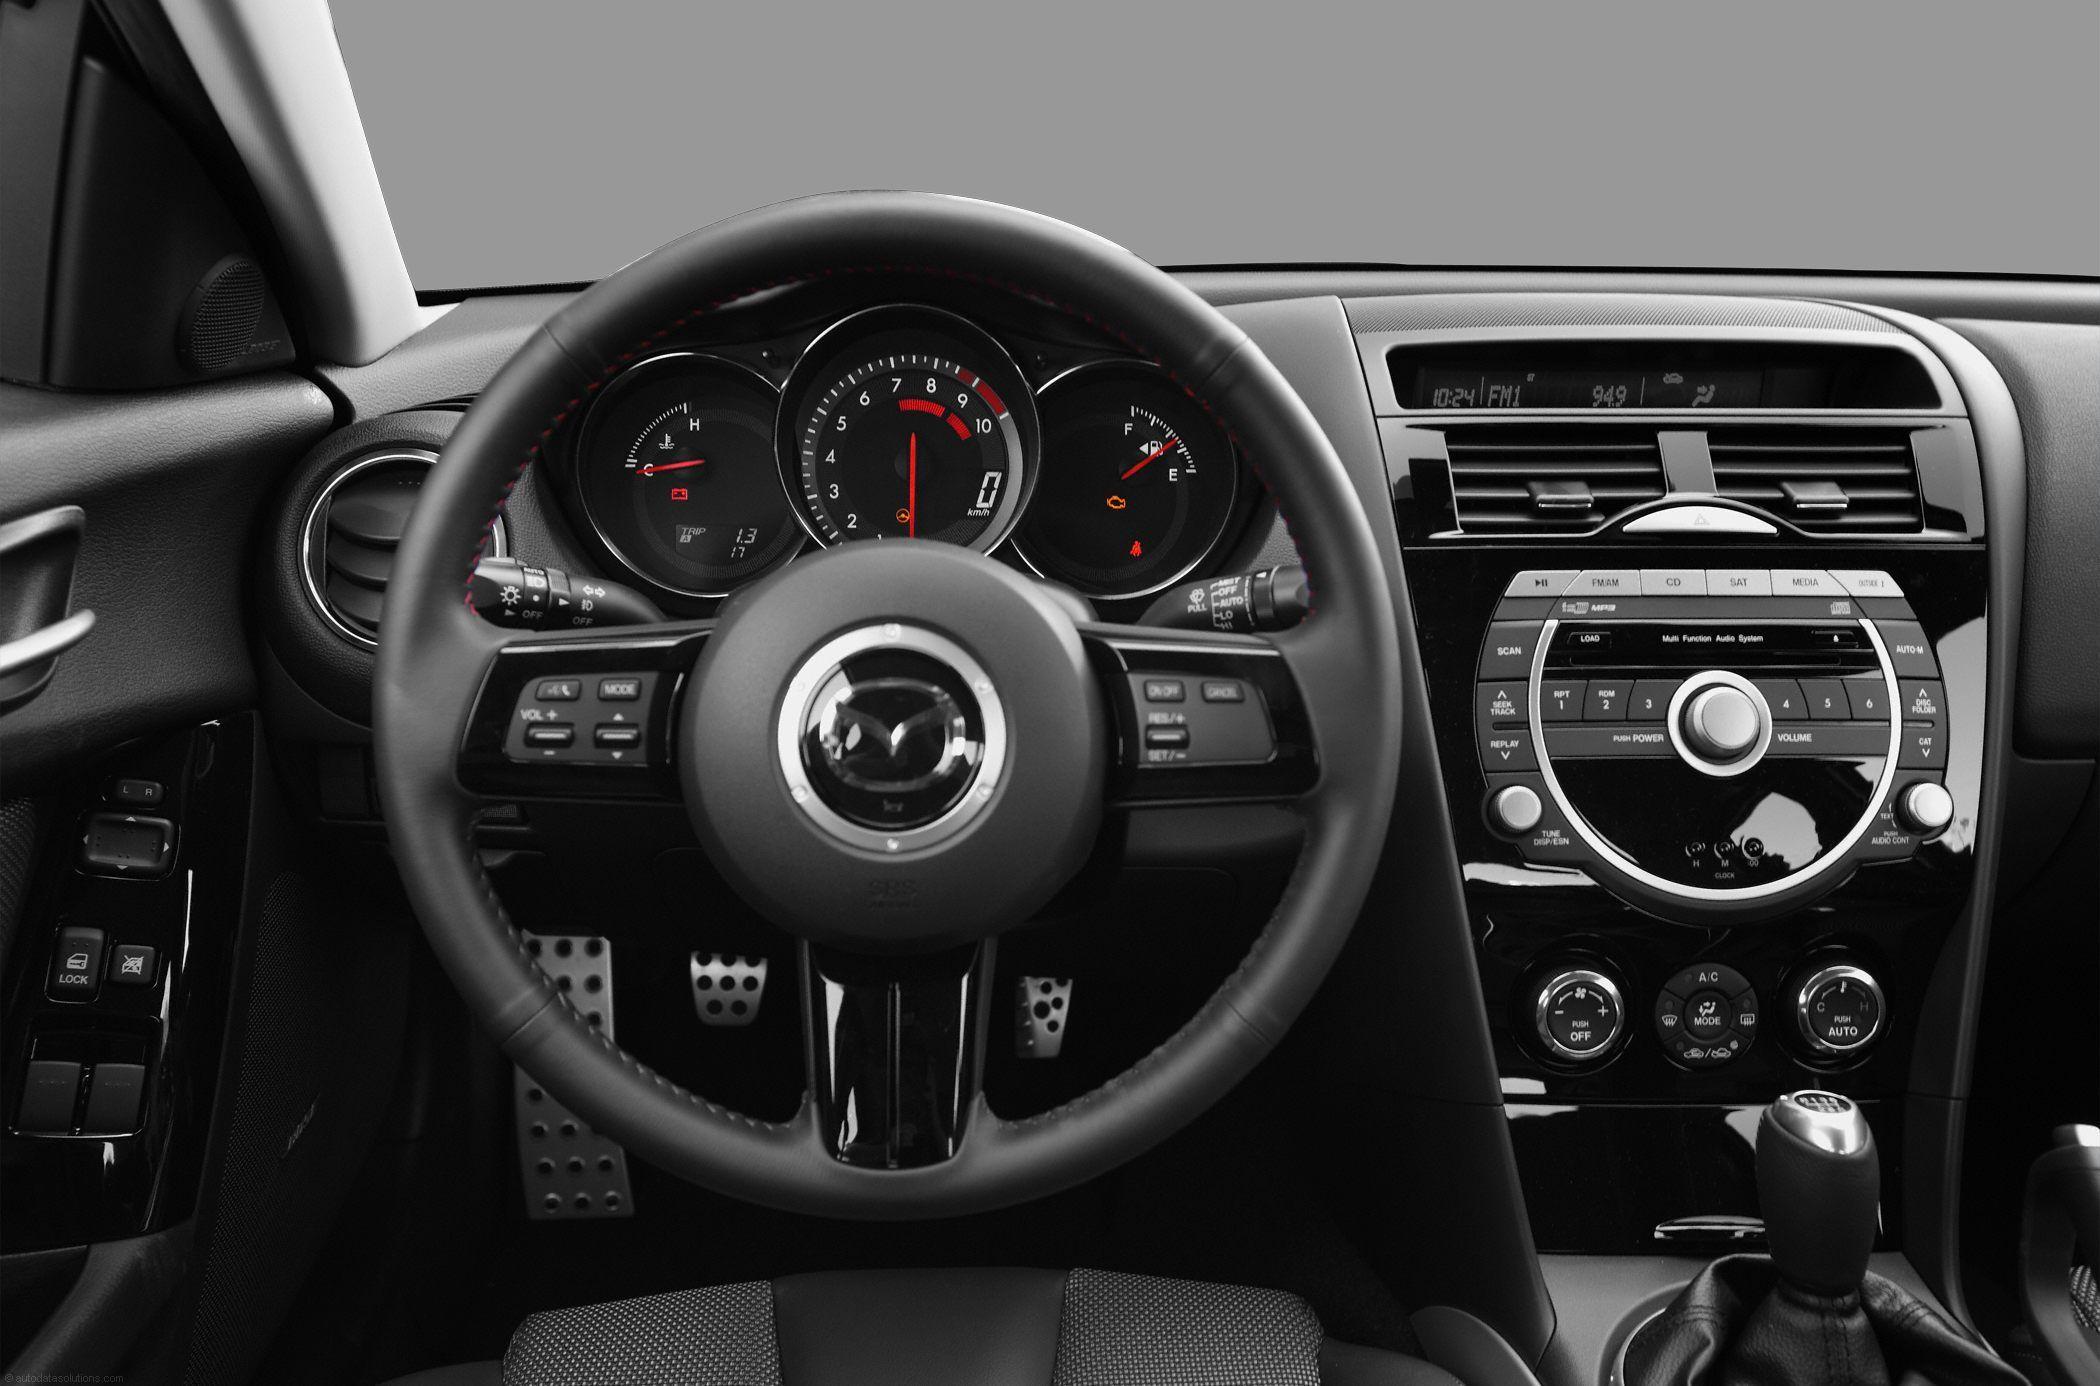 Pin By Jeremy Elliott On My Car Mazda Cars Car Interior Design